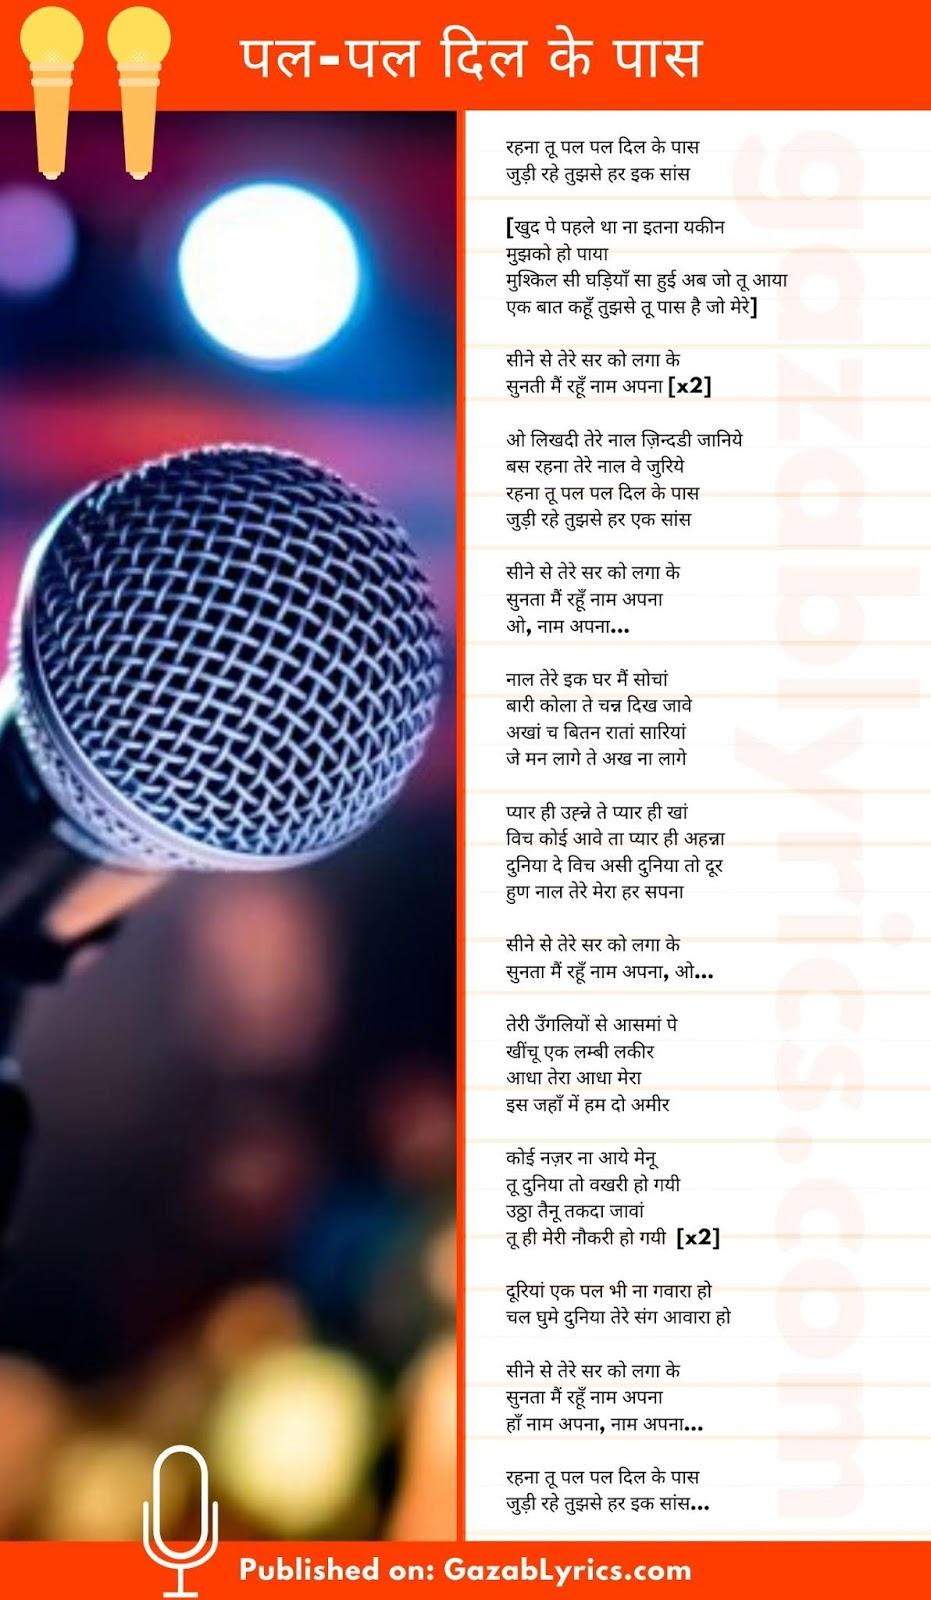 Pal Pal Dil Ke Paas song lyrics image